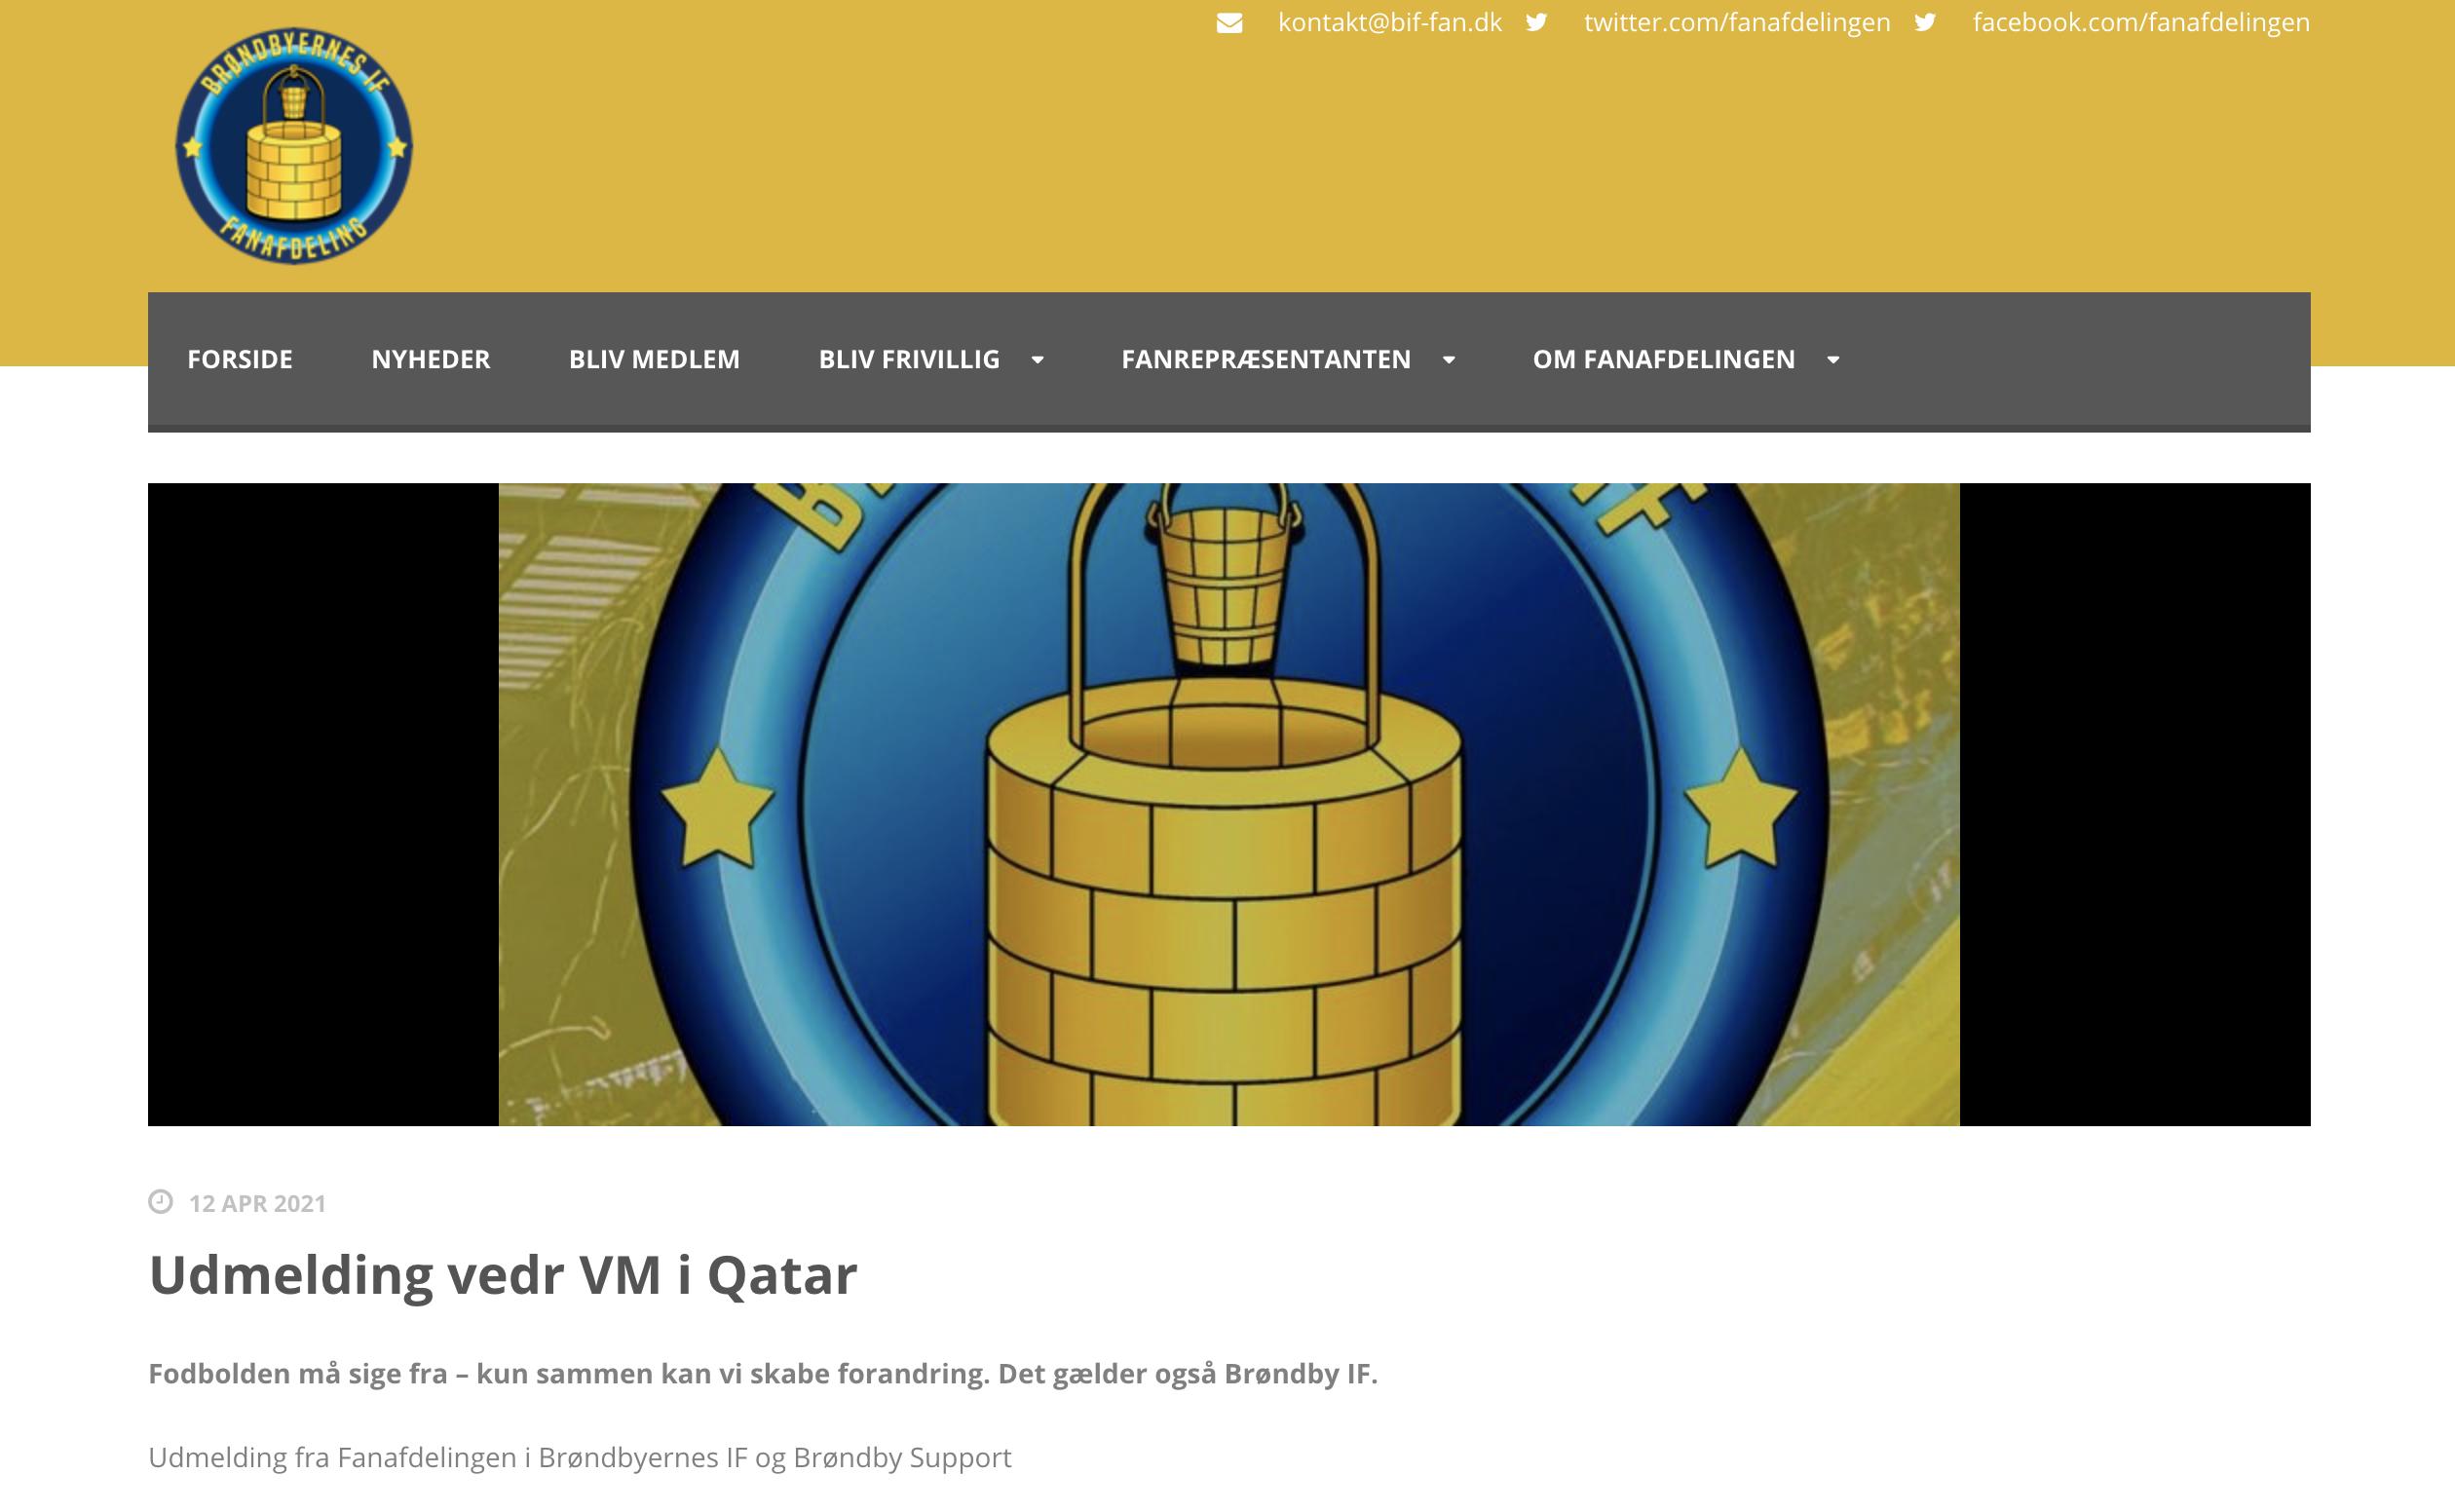 Brøndby Fans: Boikott Qatar